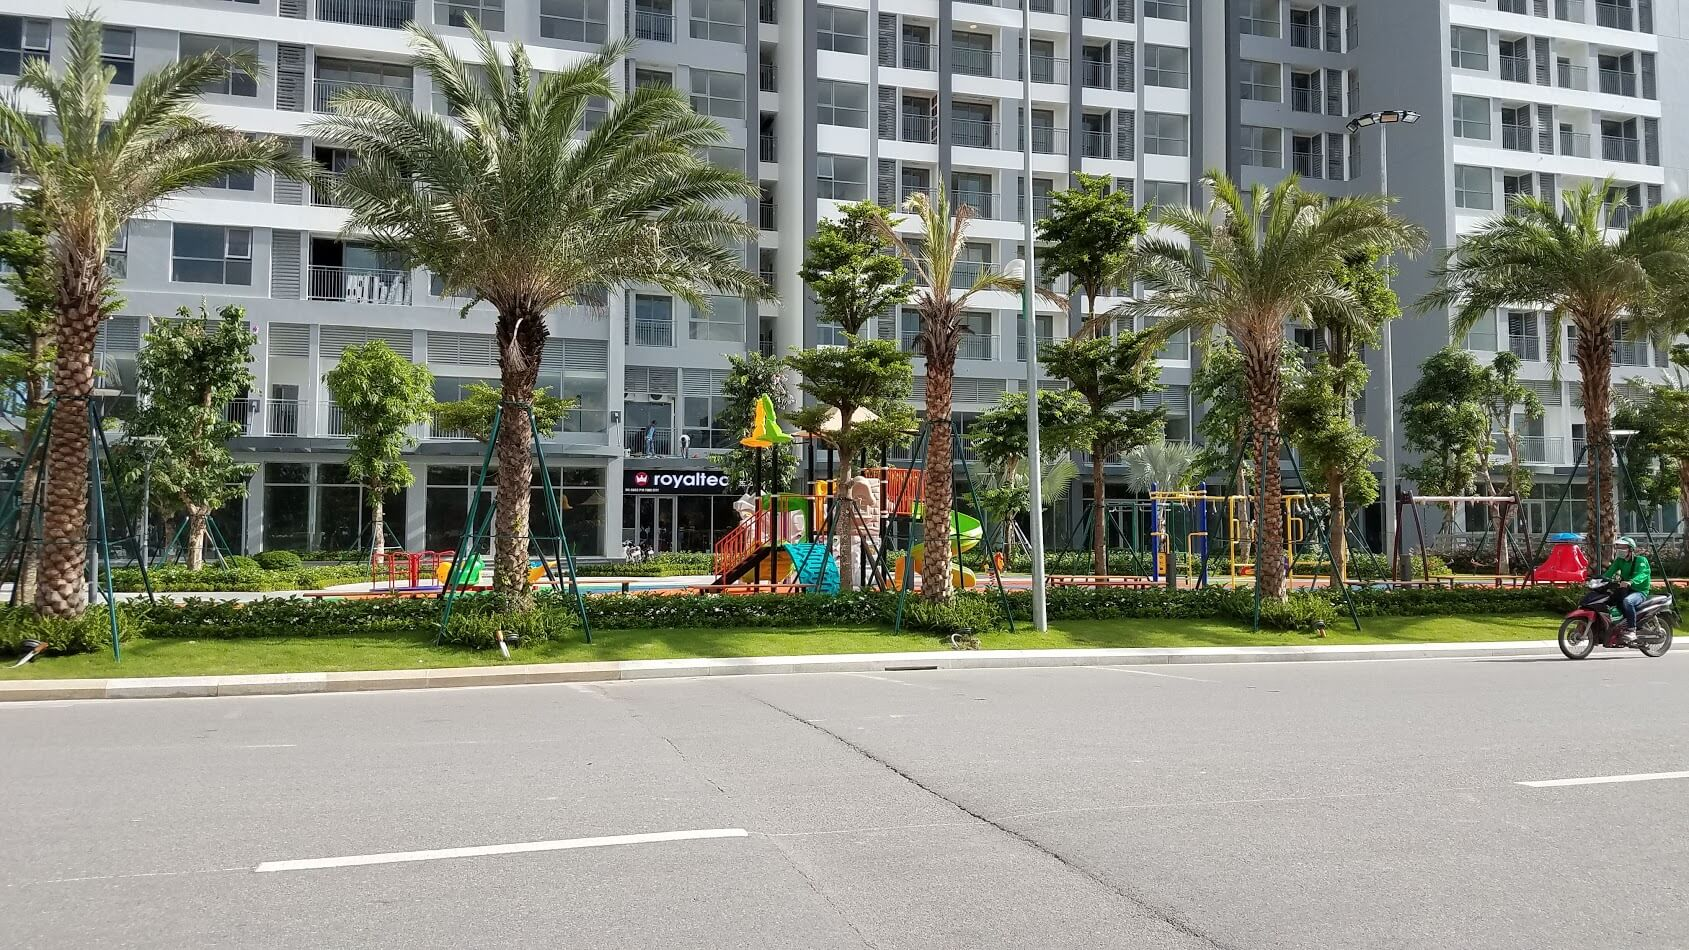 Sân chơi trẻ em Park 10, Times City Park Hill Premium